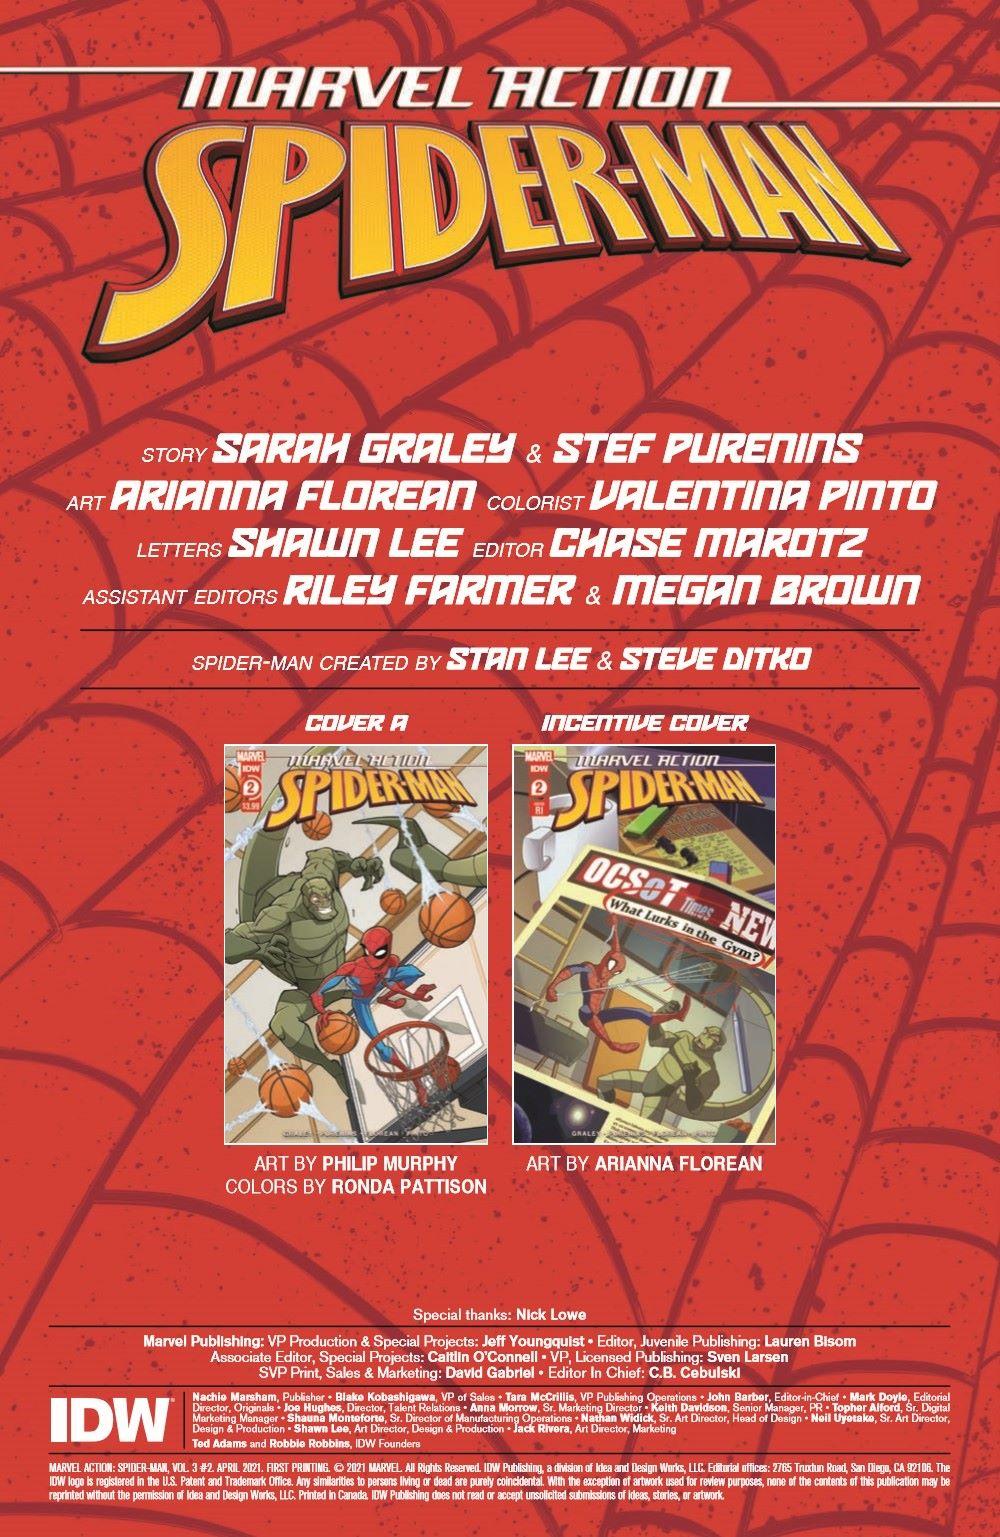 SpidermanV3-02_pr-2 ComicList Previews: MARVEL ACTION SPIDER-MAN VOLUME 3 #2